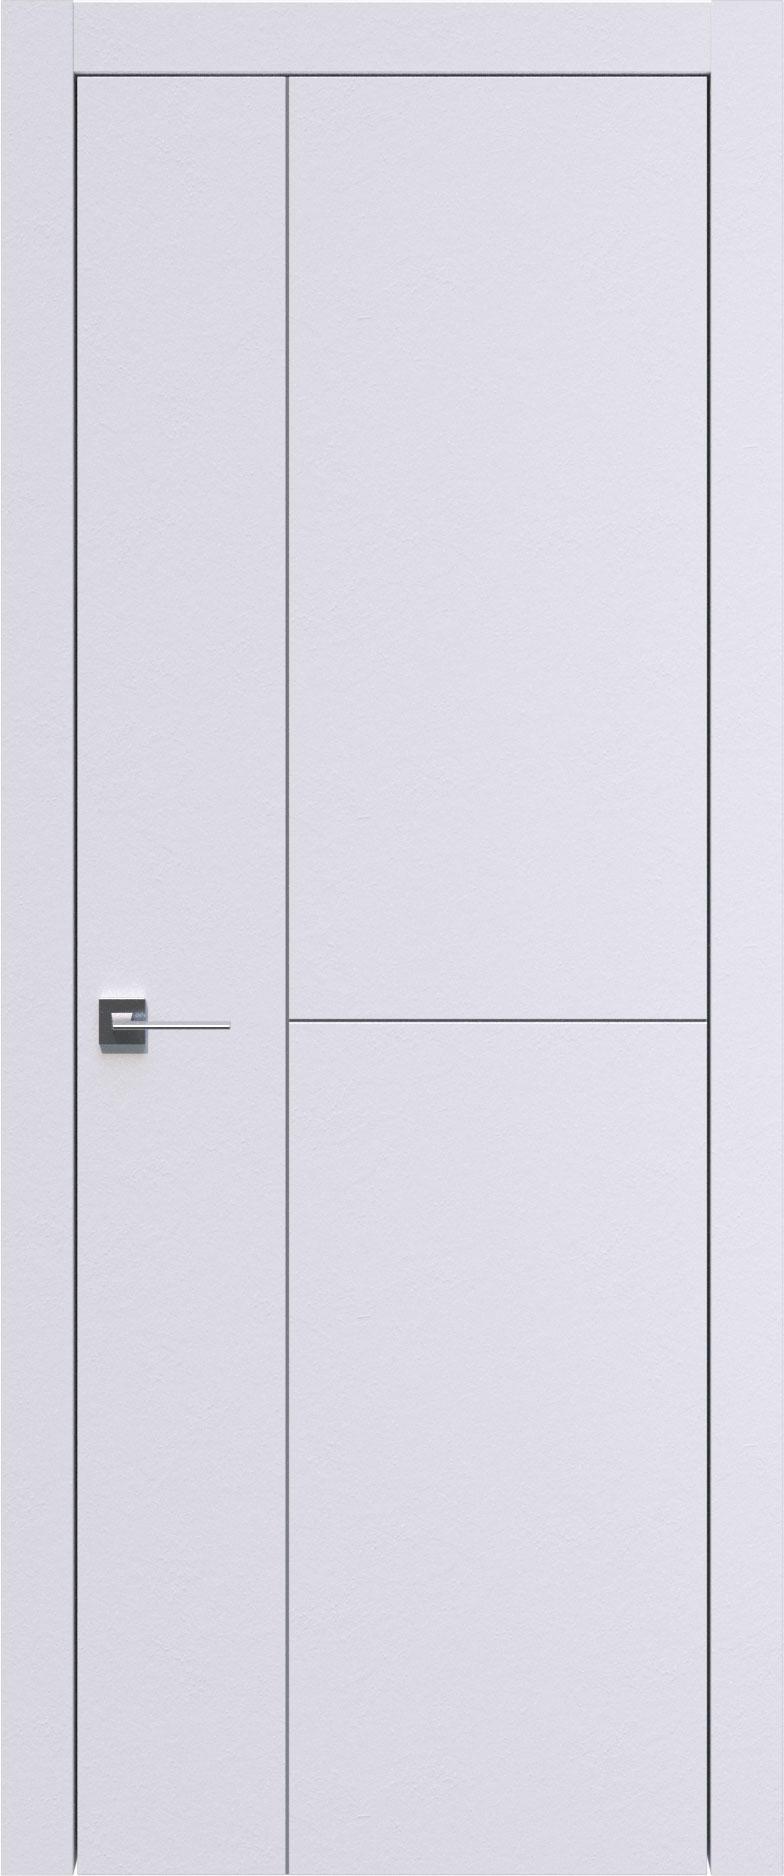 Tivoli Г-1 цвет - Арктик белый Без стекла (ДГ)